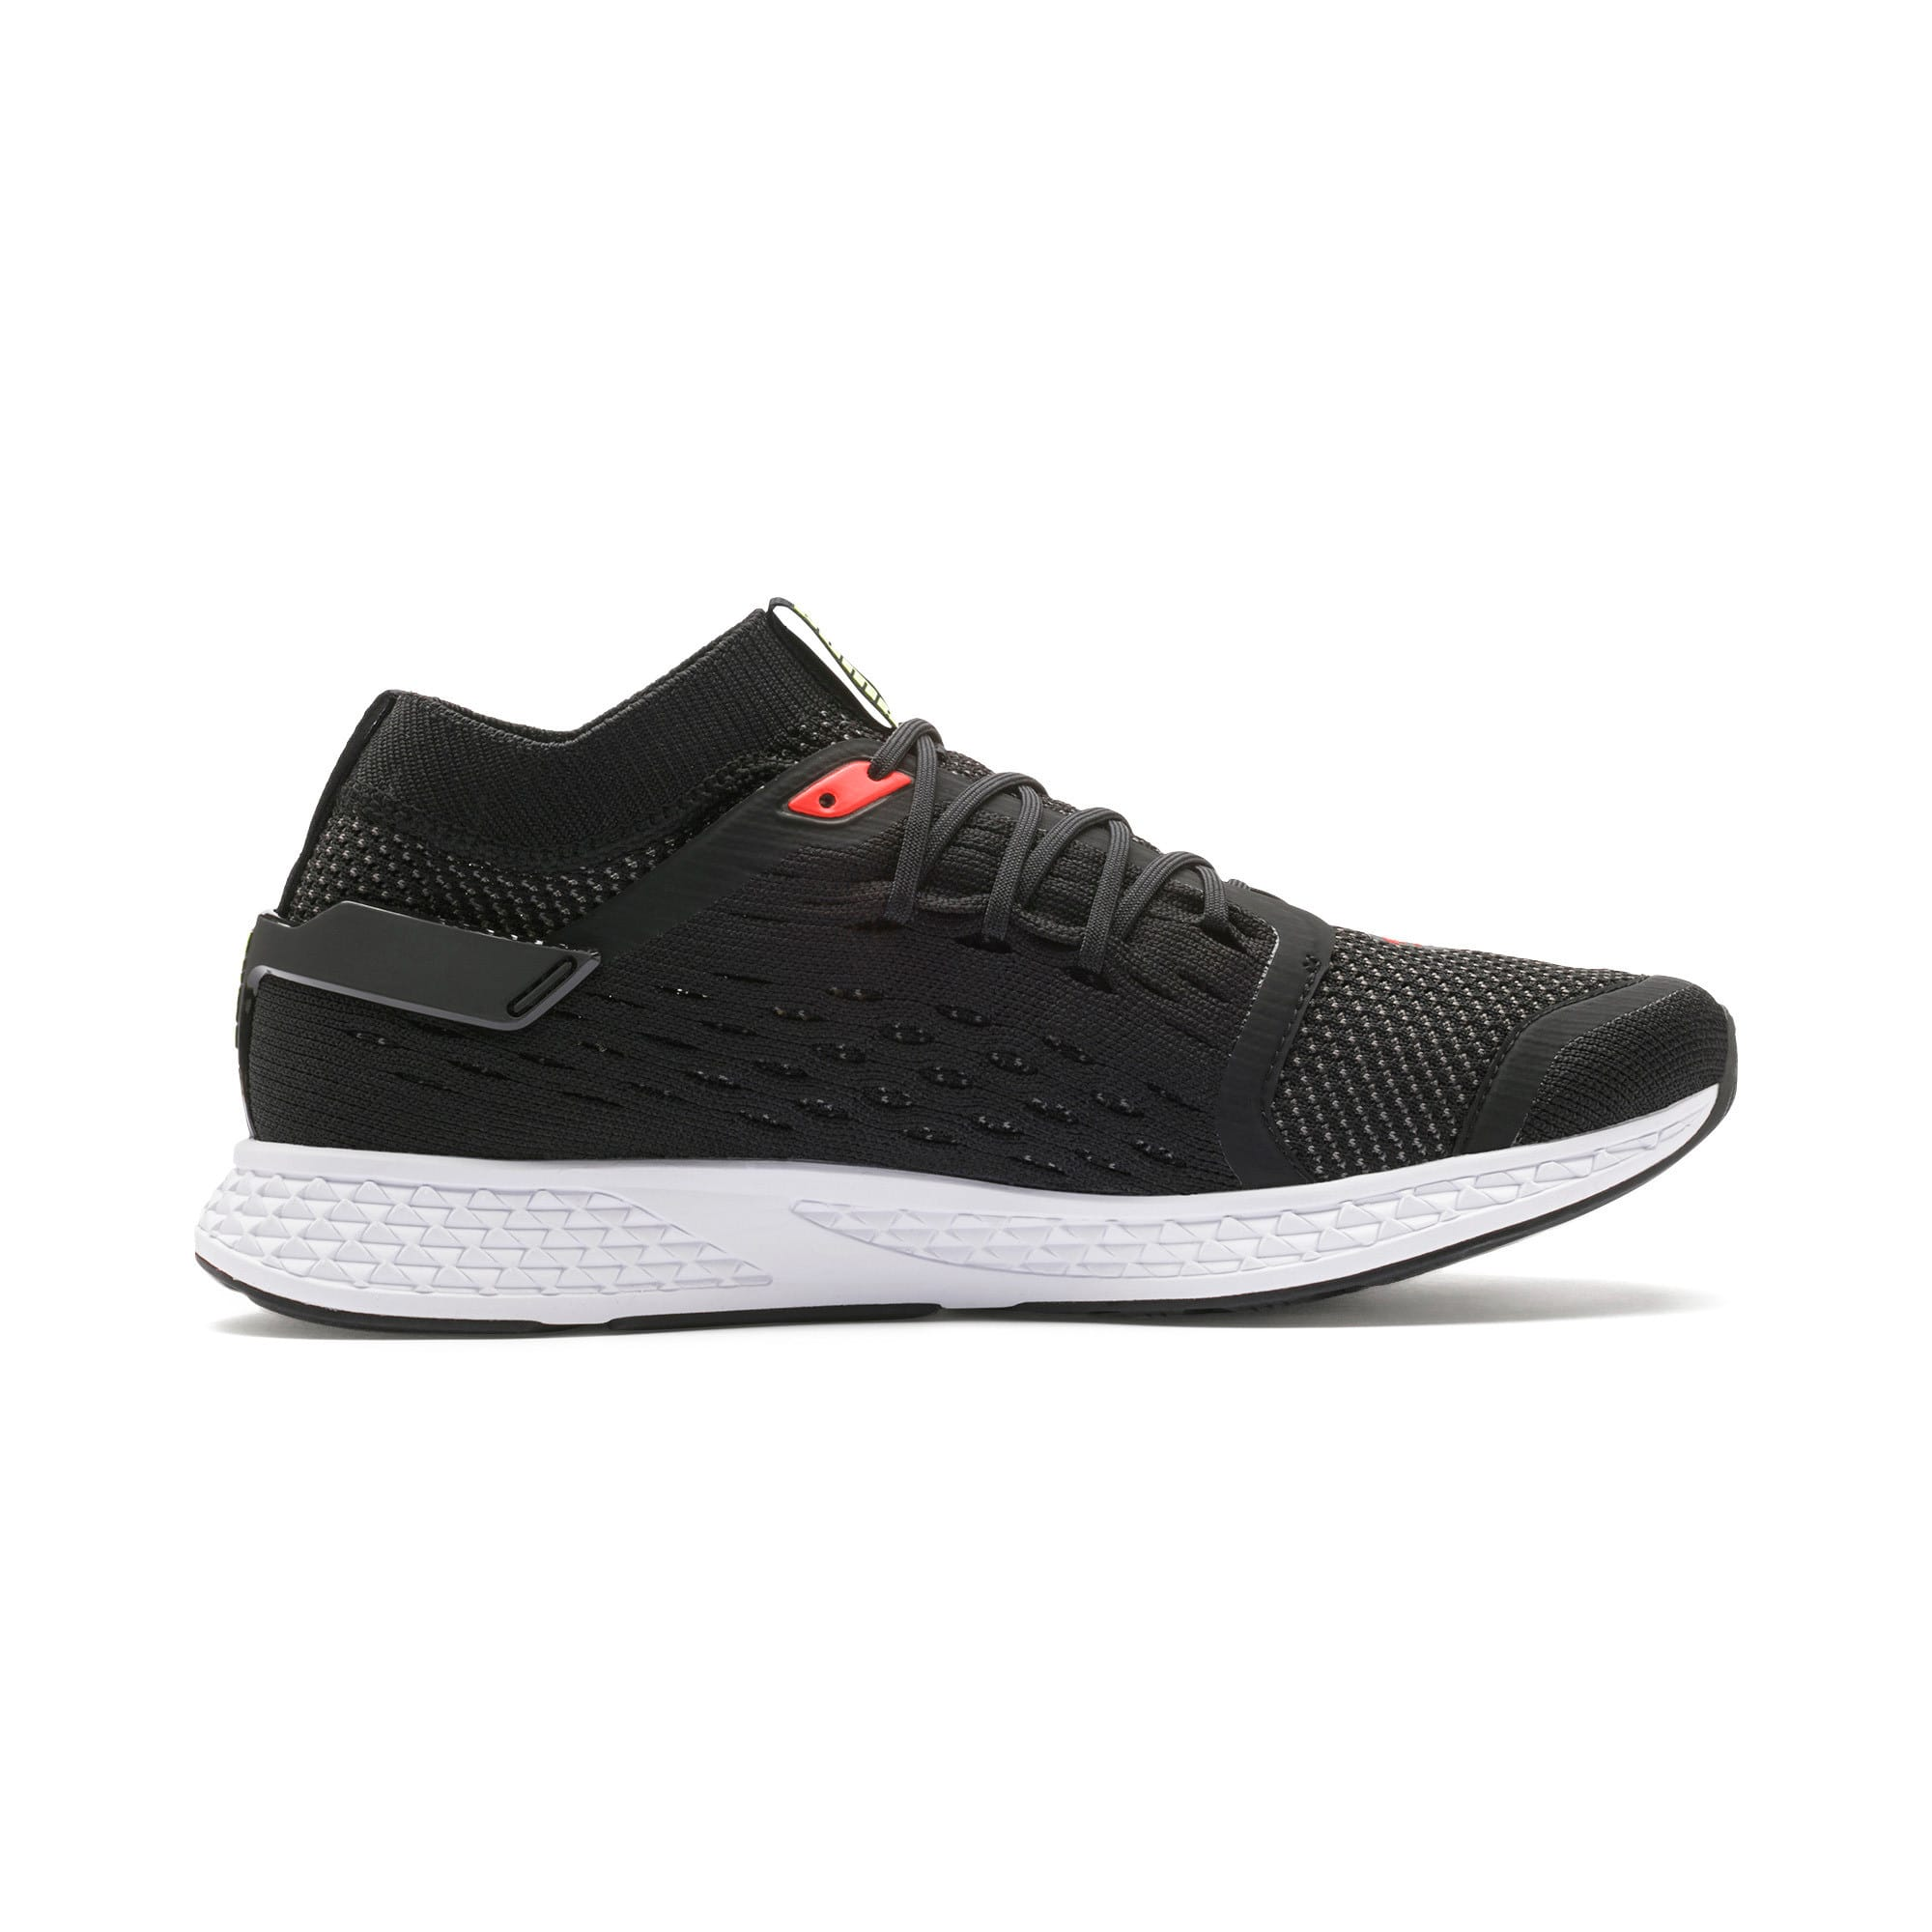 Thumbnail 6 of SPEED 500 Men's Running Shoes, Black-White-Red-Yellow, medium